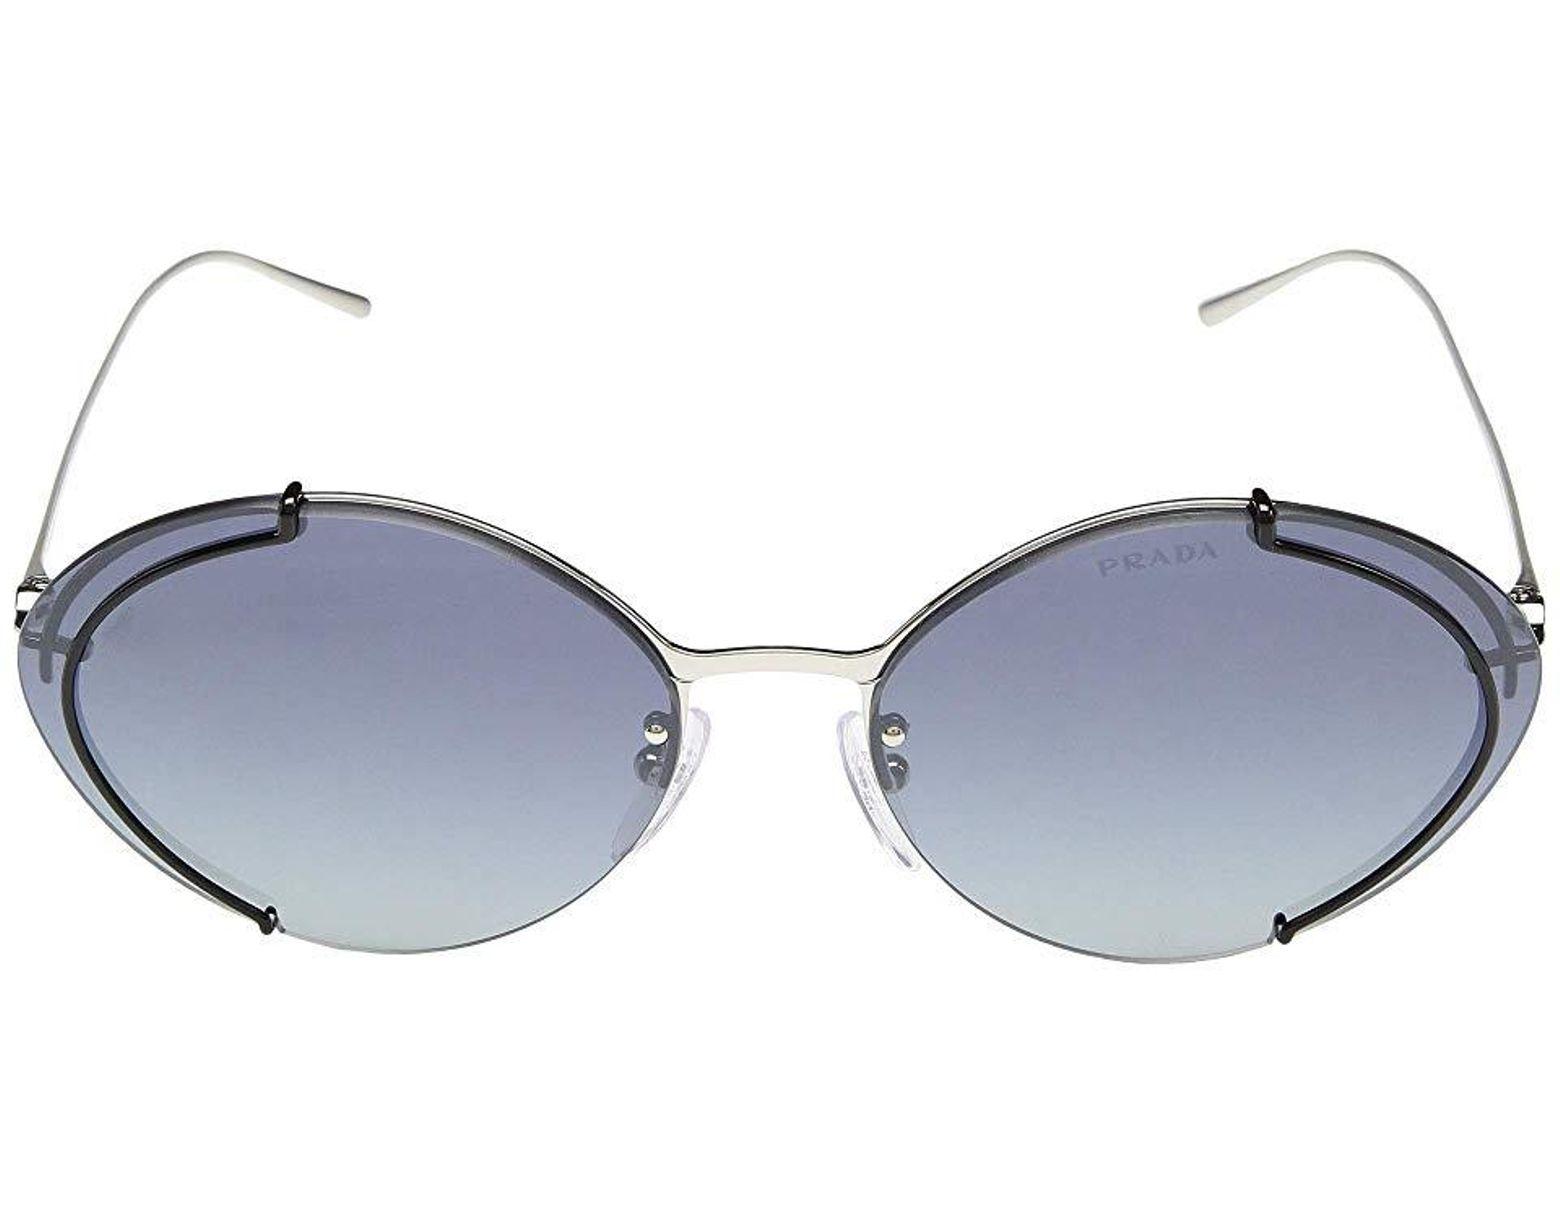 06dedc388 Prada 0pr 60us (gunmetal/gradient Grey Mirror Silver) Fashion Sunglasses in  Gray - Lyst